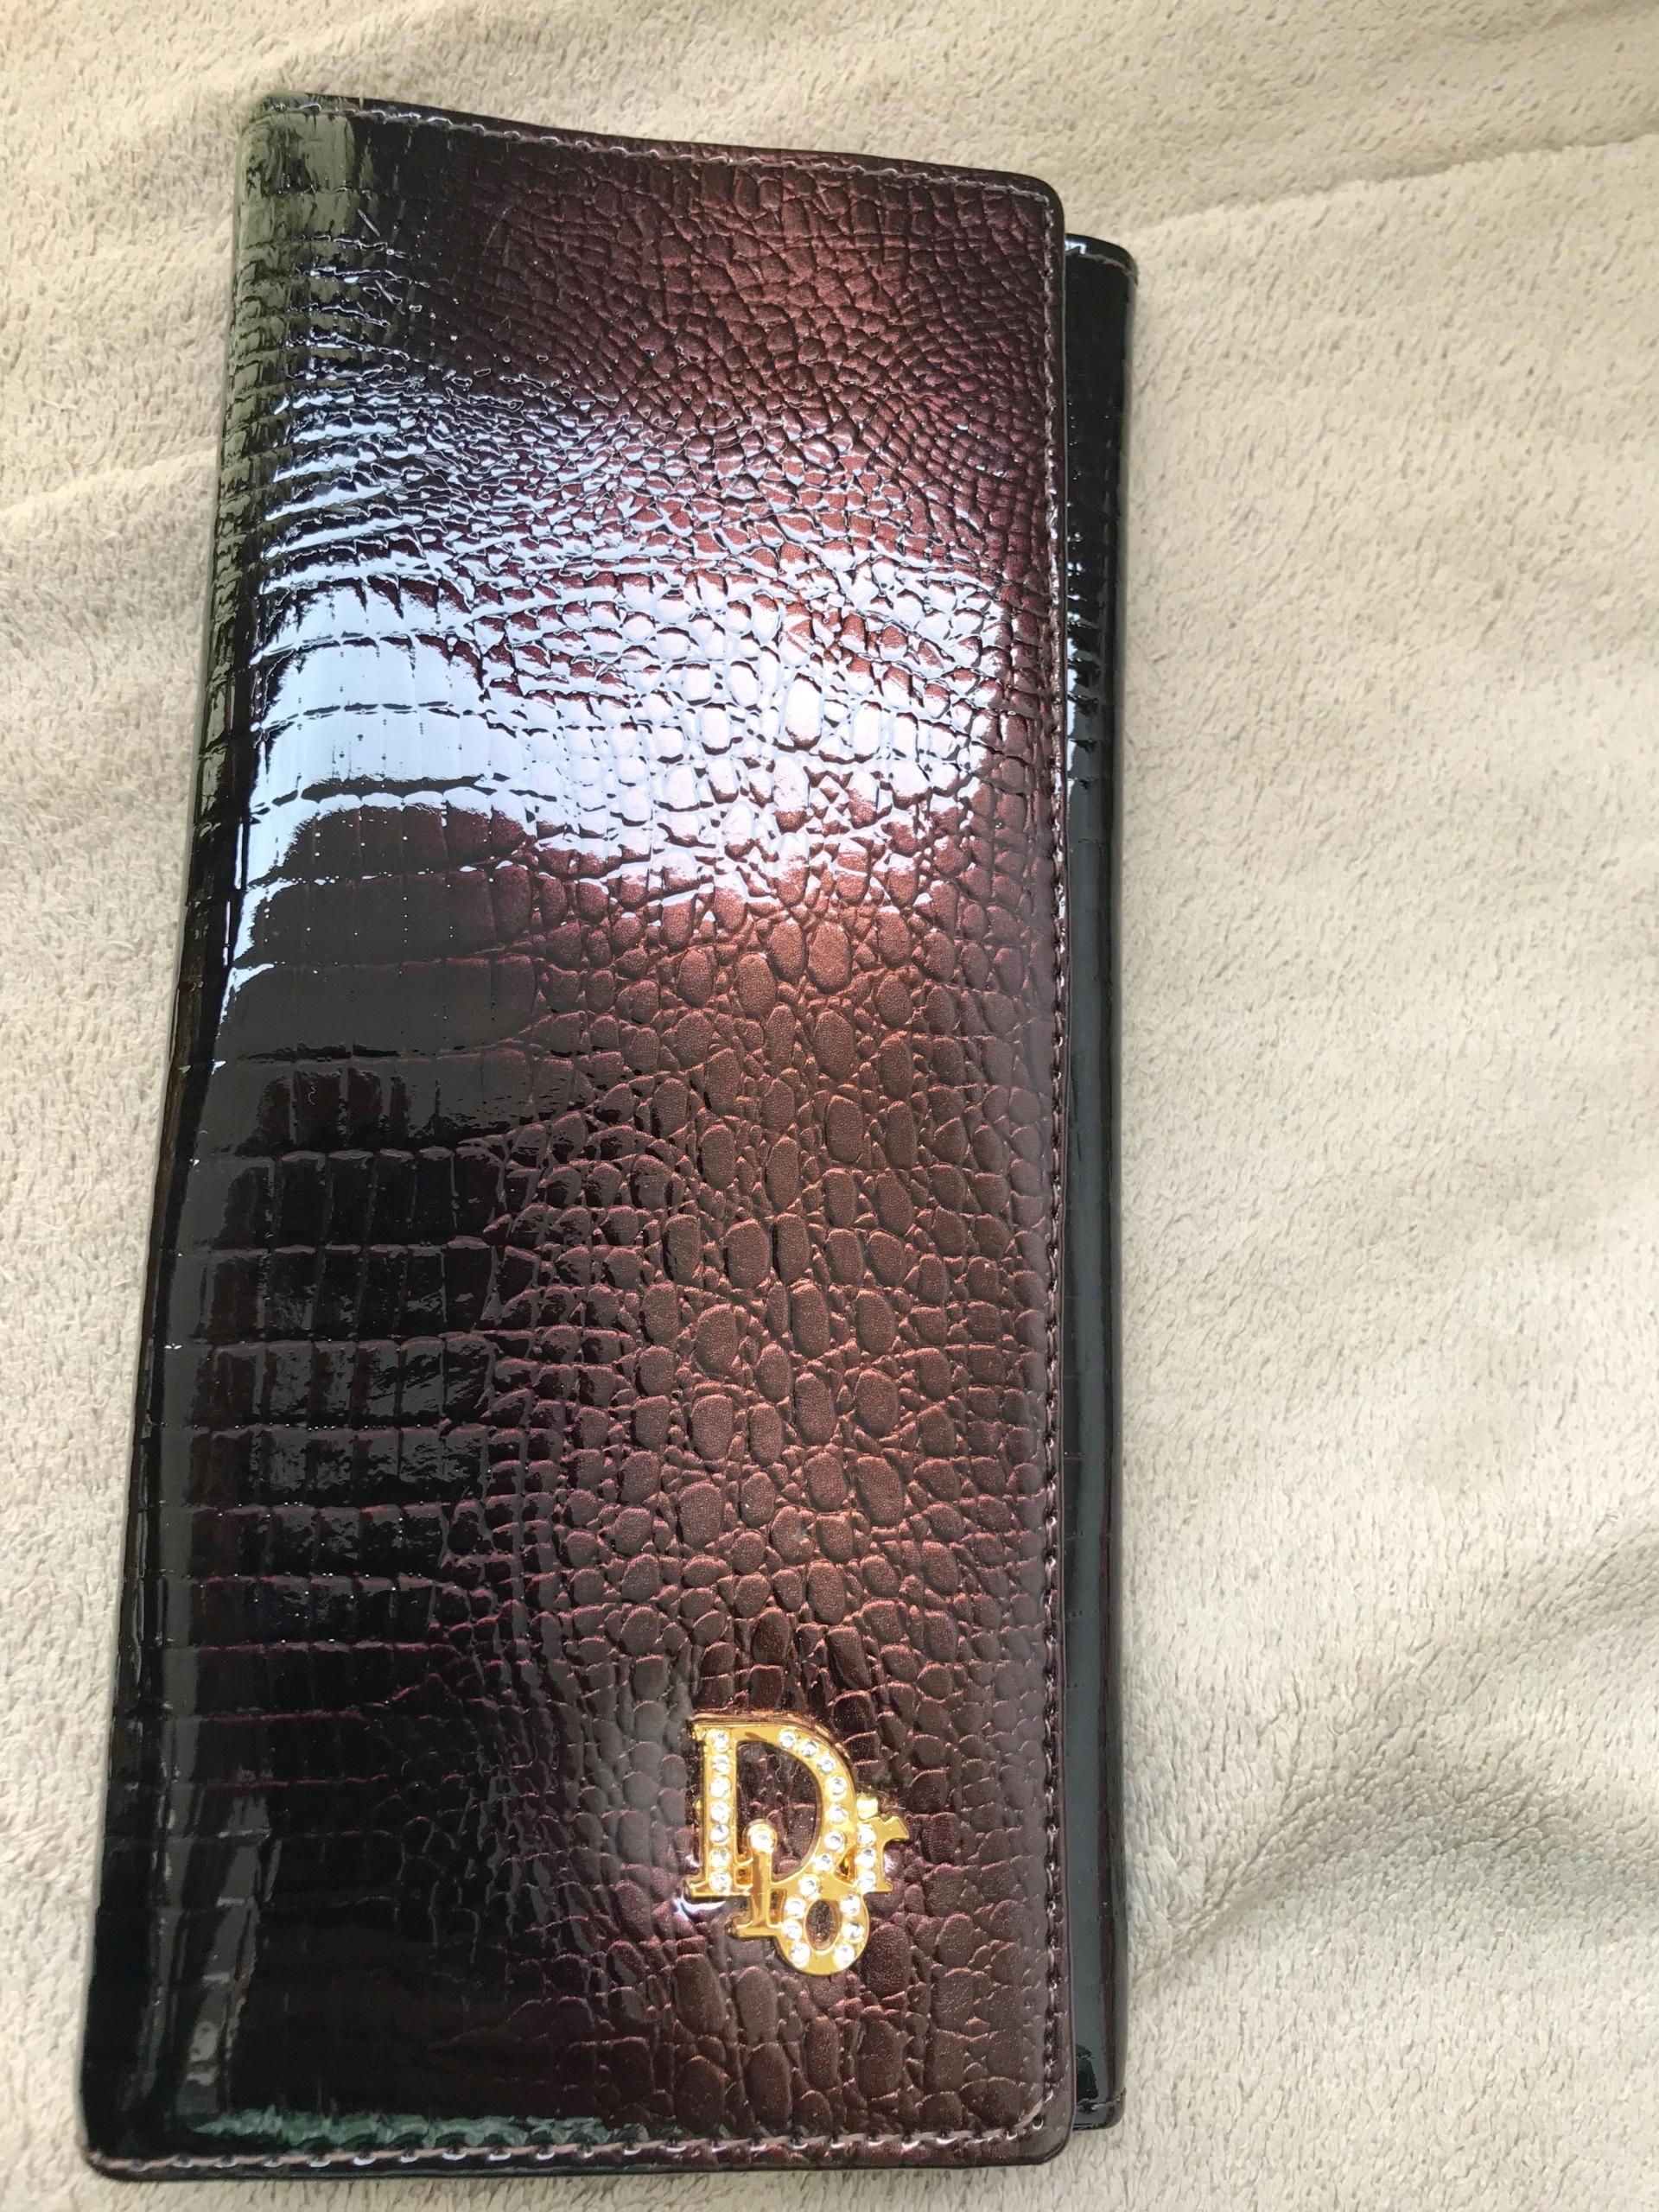 d1e716239e028 Damski portfel dior - 7561376141 - oficjalne archiwum allegro